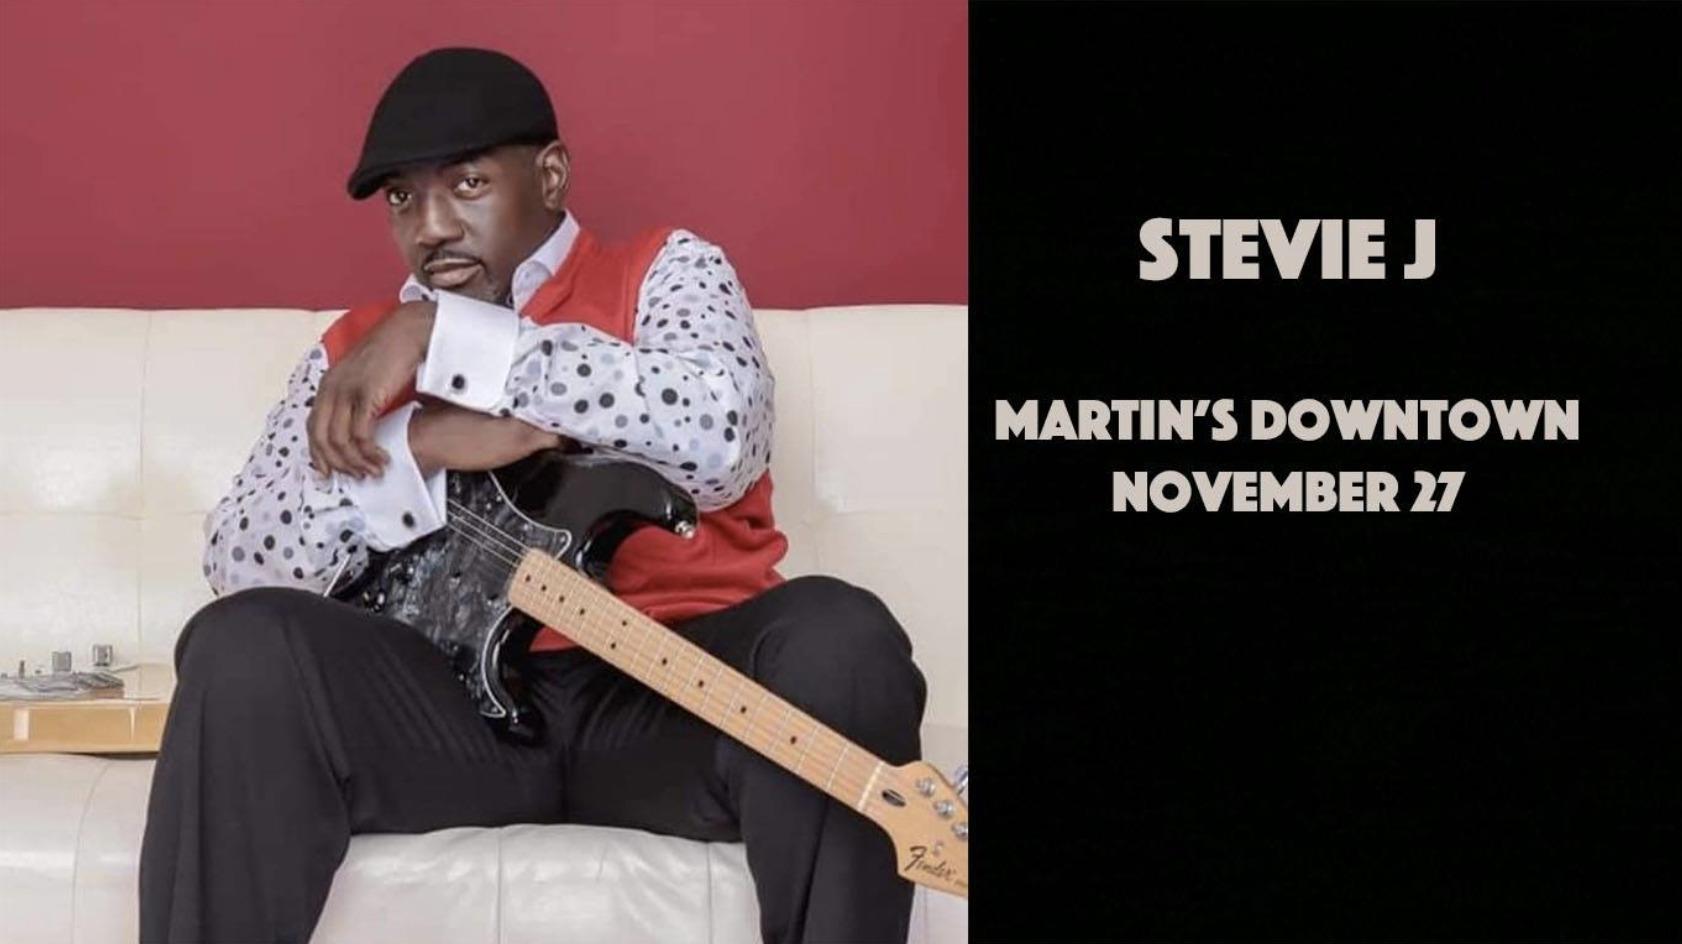 Stevie J at Martin's Downtown